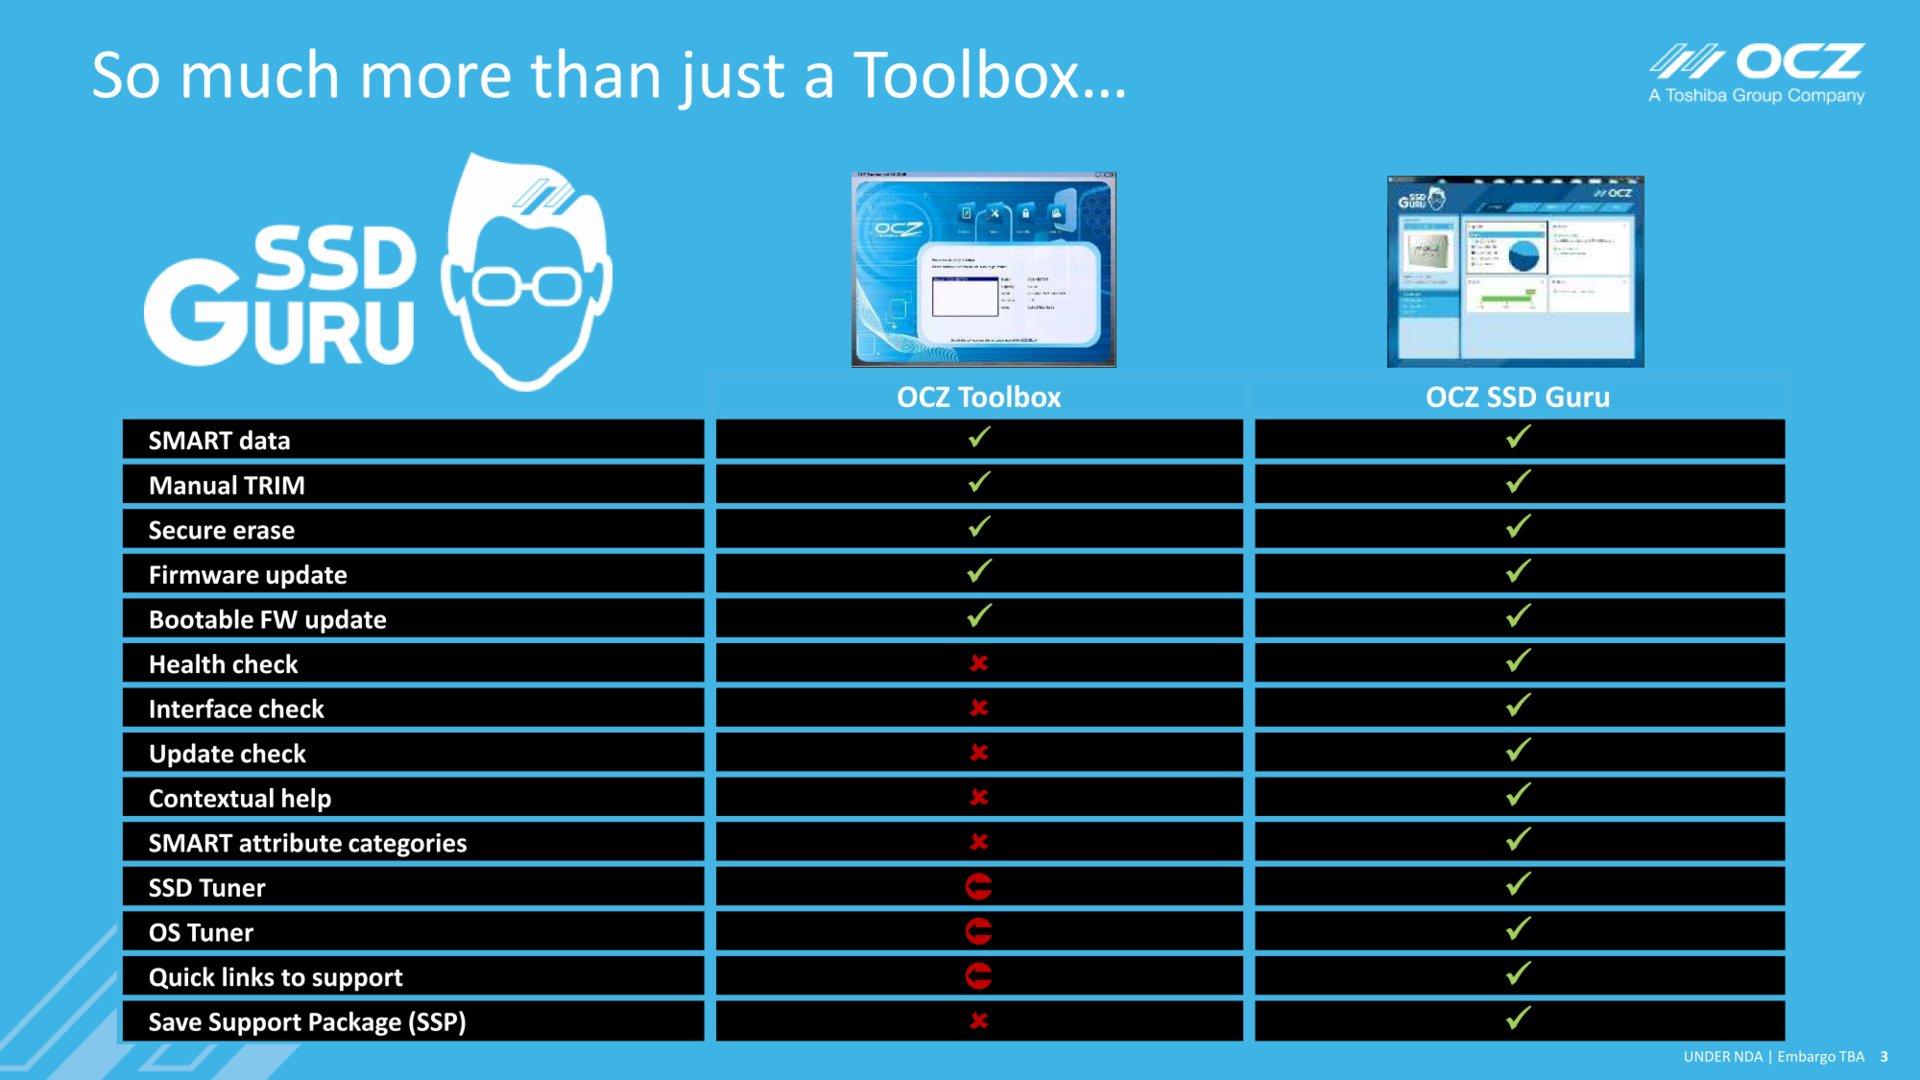 OCZ SSD Guru versus OCZ Toolbox